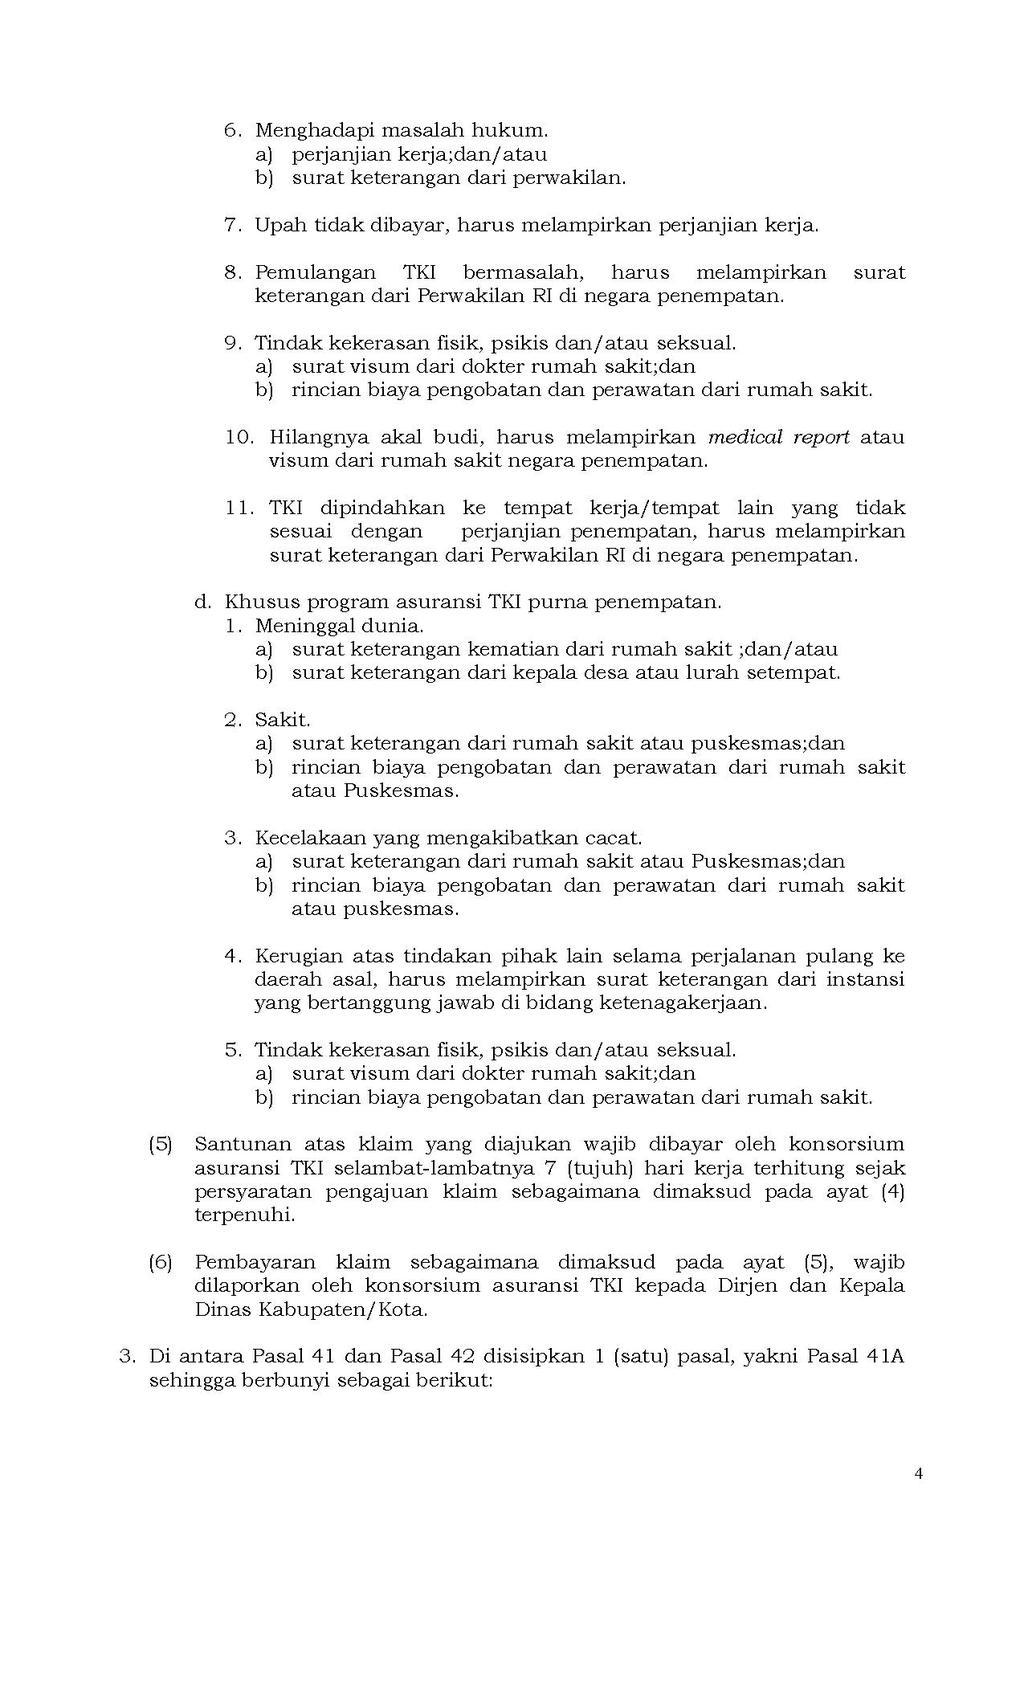 Halamanpermenakertrans 1 2012pdf4 Wikisource Bahasa